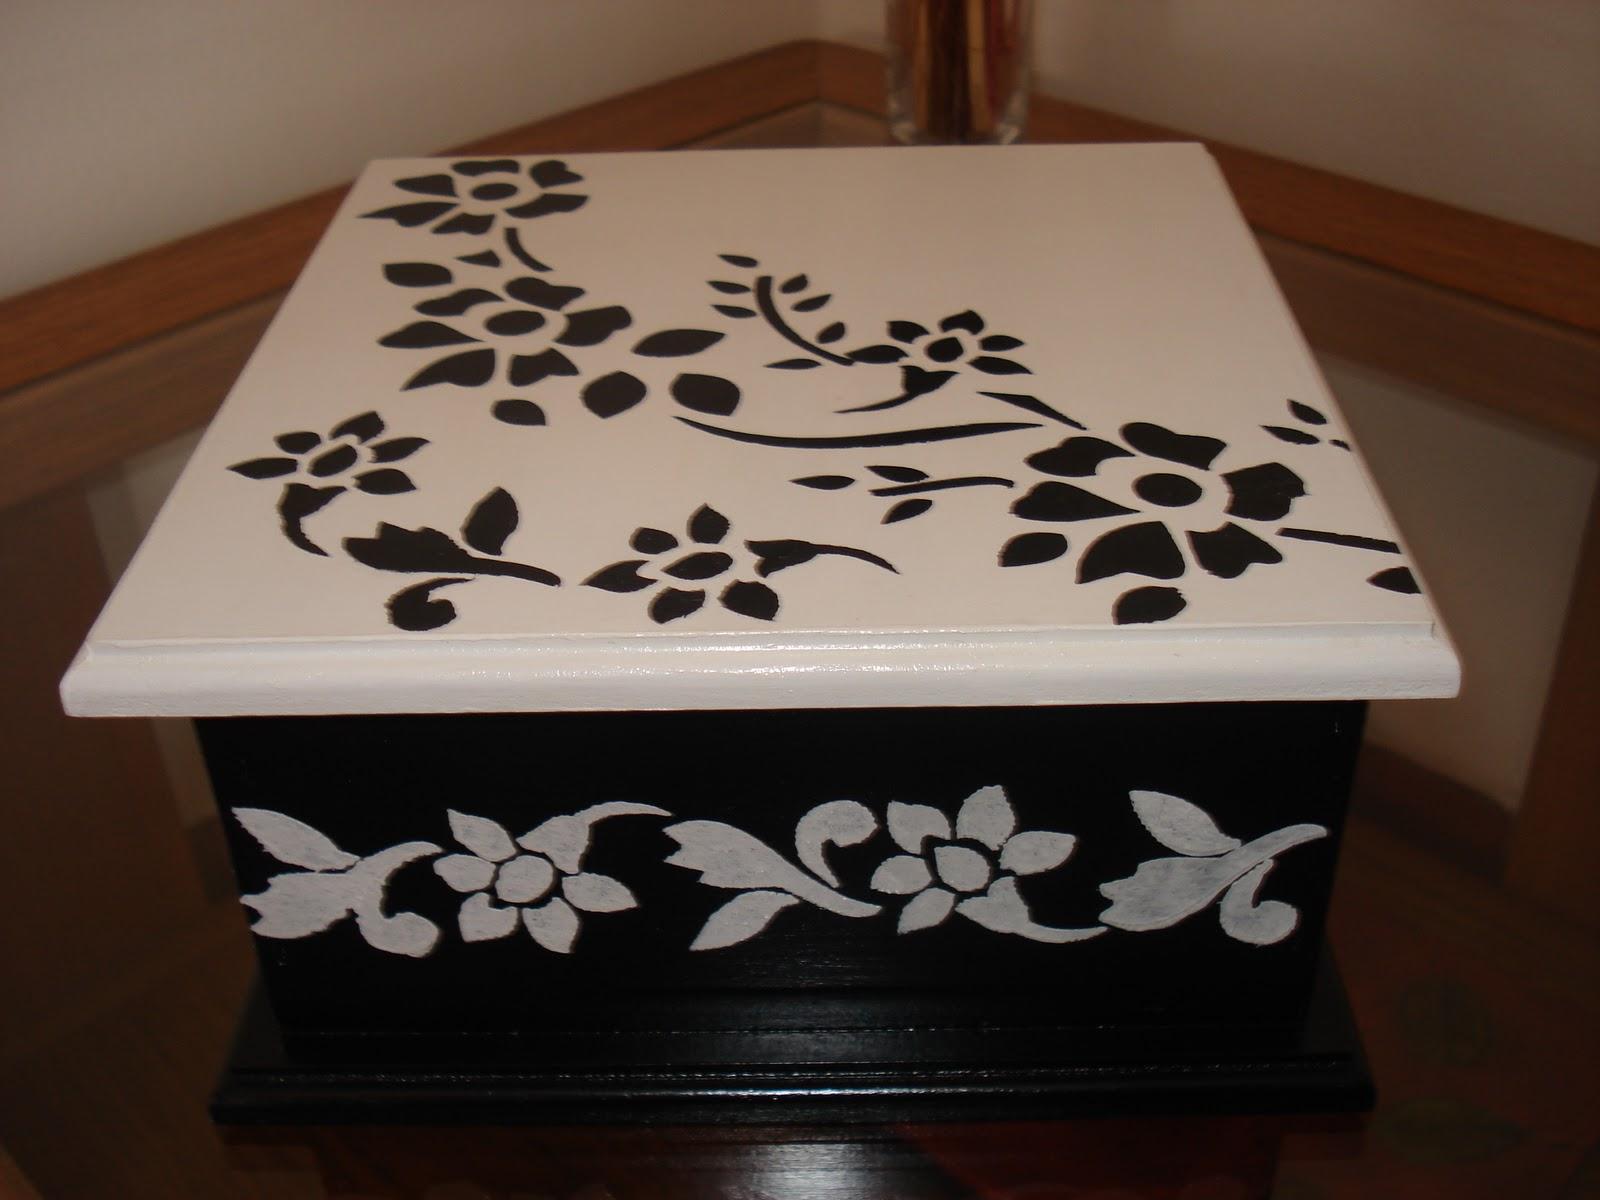 Vany cajas de te - Cajas de madera pintadas a mano ...